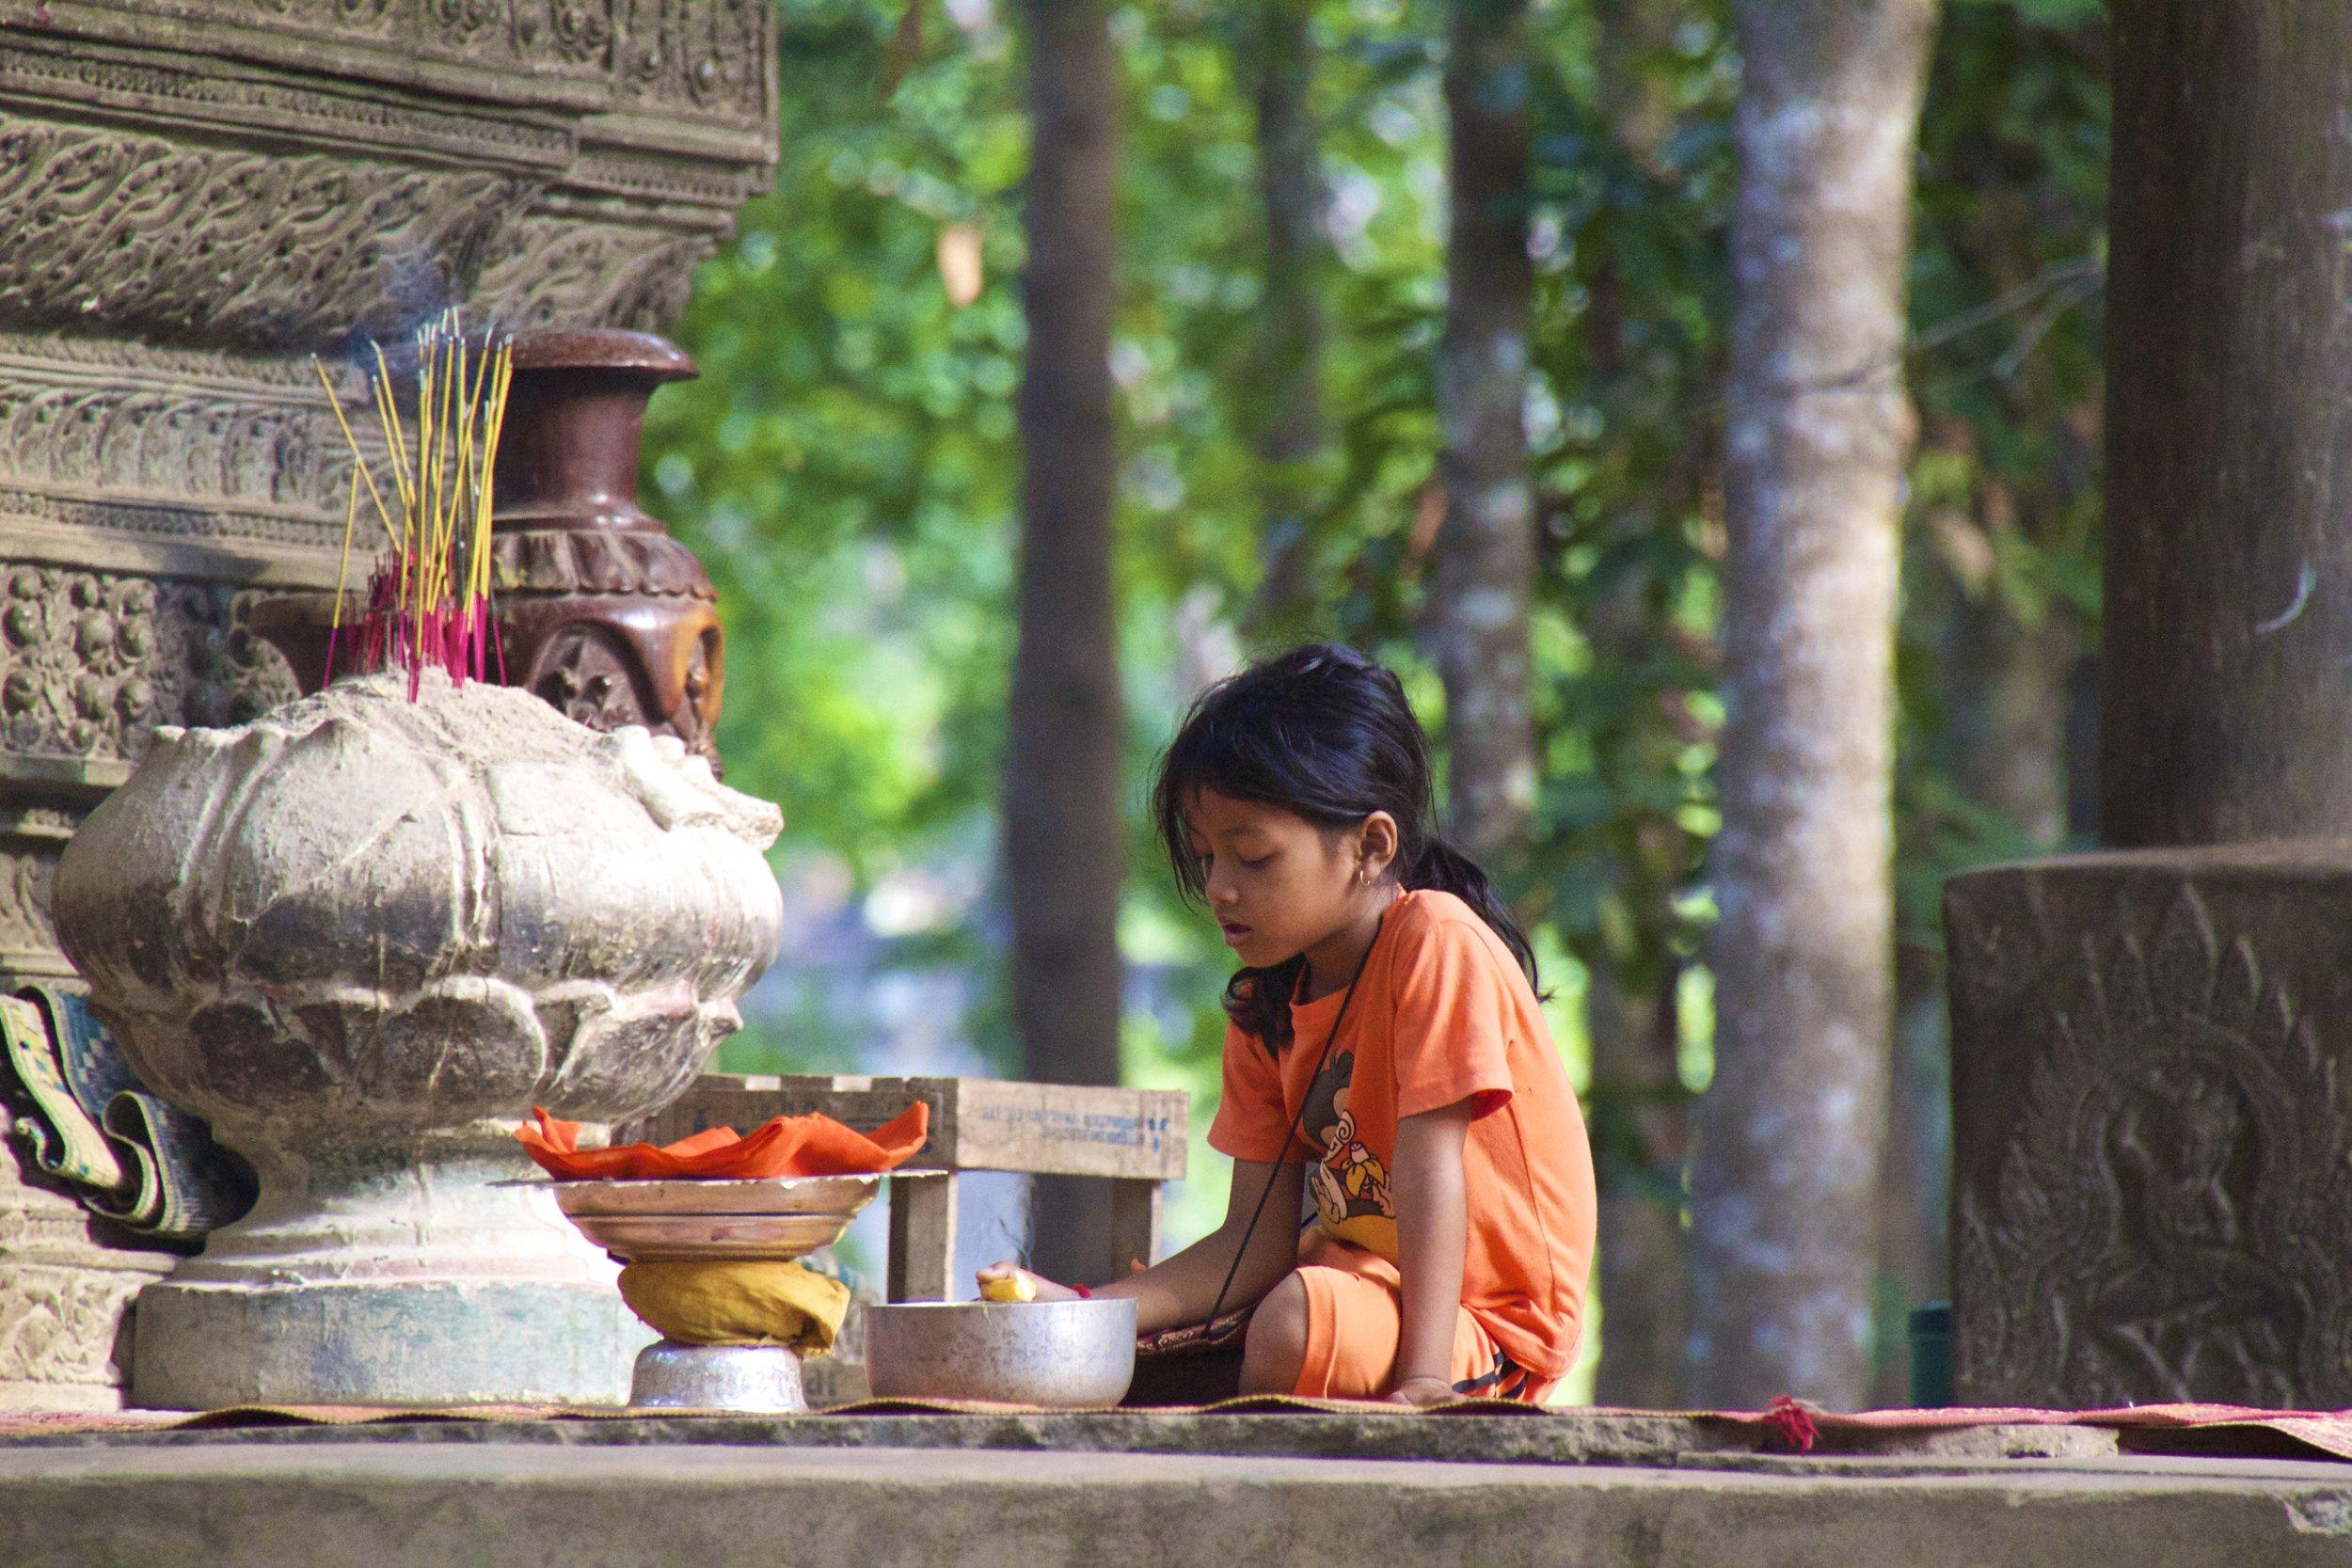 angkor wat siem reap cambodia 14.jpg